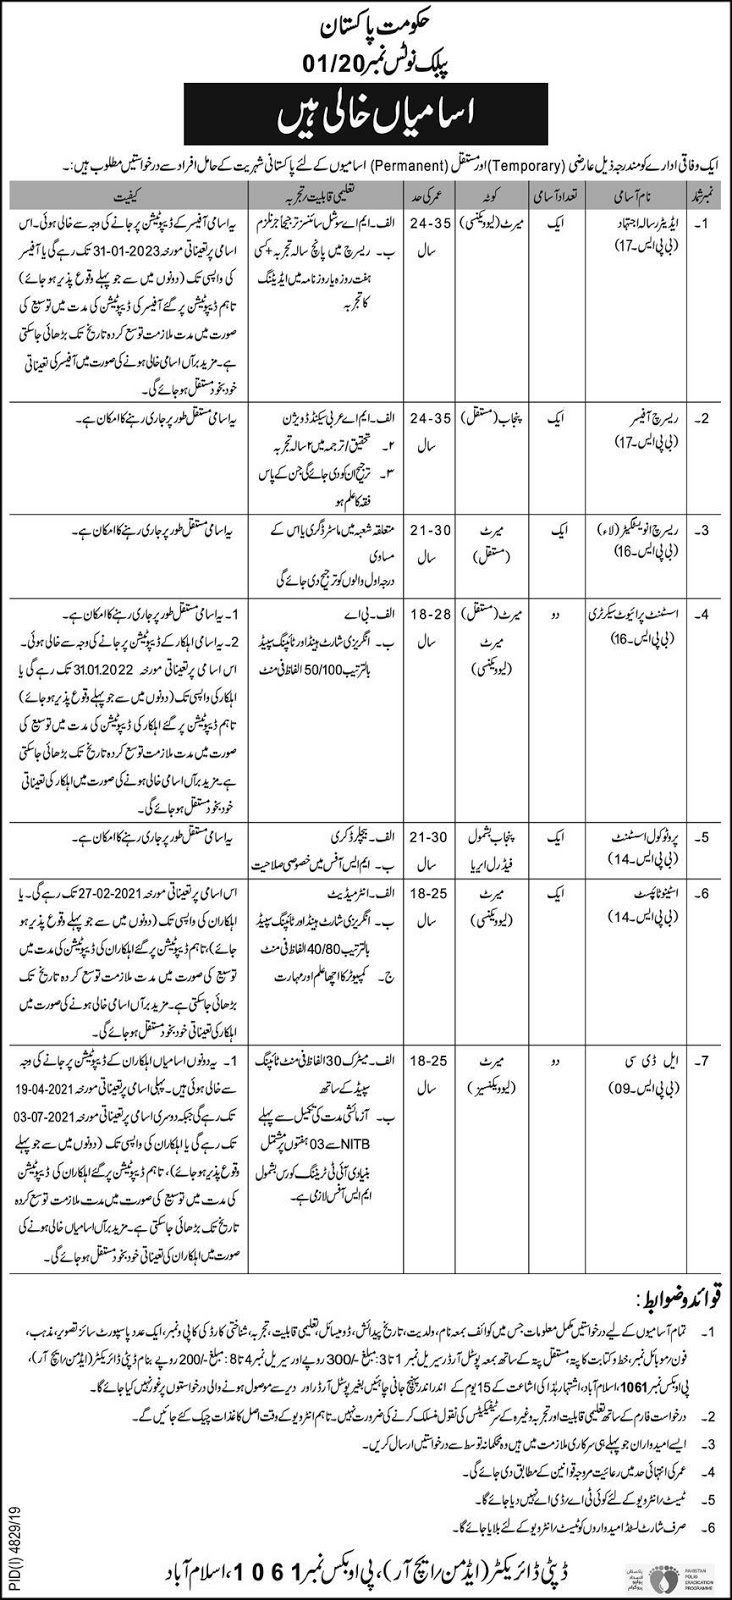 Jobs in Public Sector Organization Po Box No 1061 Islamabad 2020